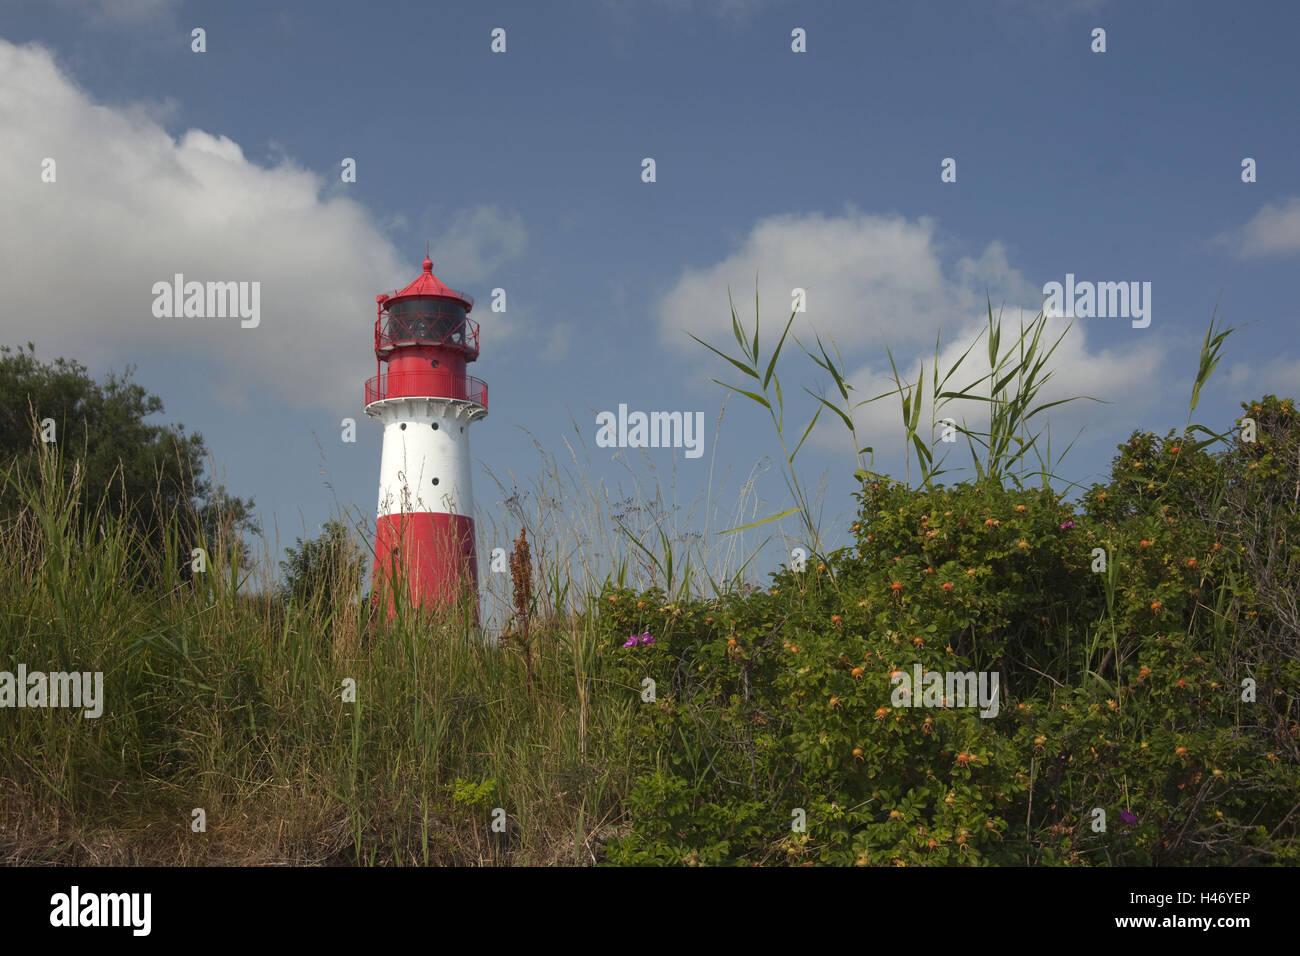 Germany, Schleswig - Holstein, region Angeln, lighthouse Falshöft, Stock Photo